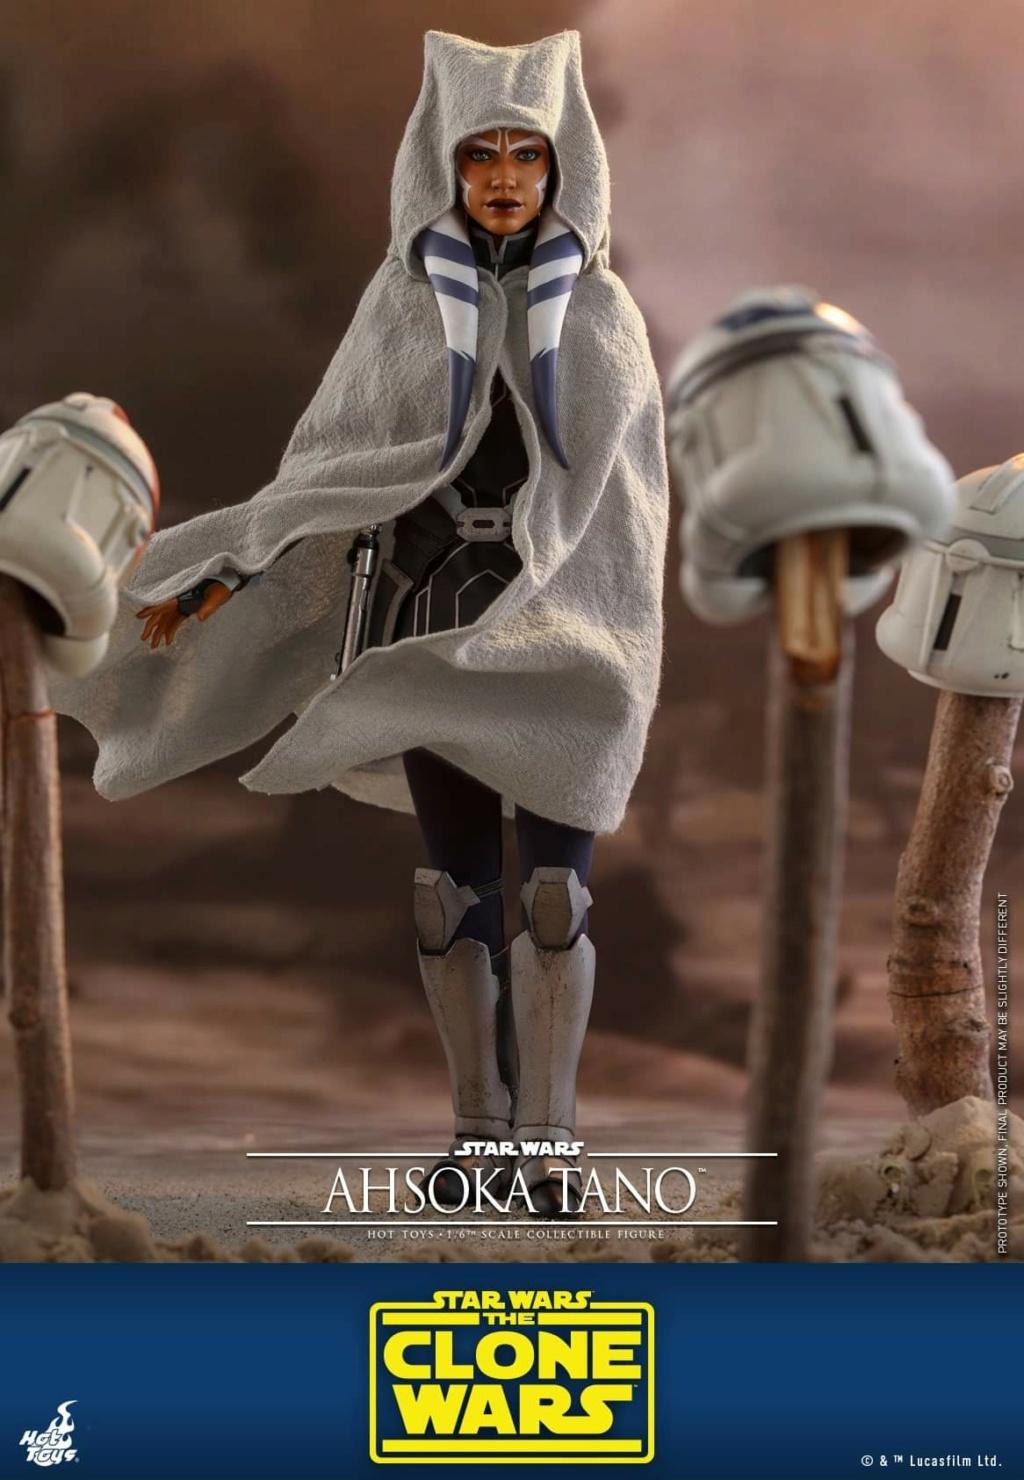 Ahsoka Tano - 1/6th scale - The Clone Wars - Hot Toys Fb_im127